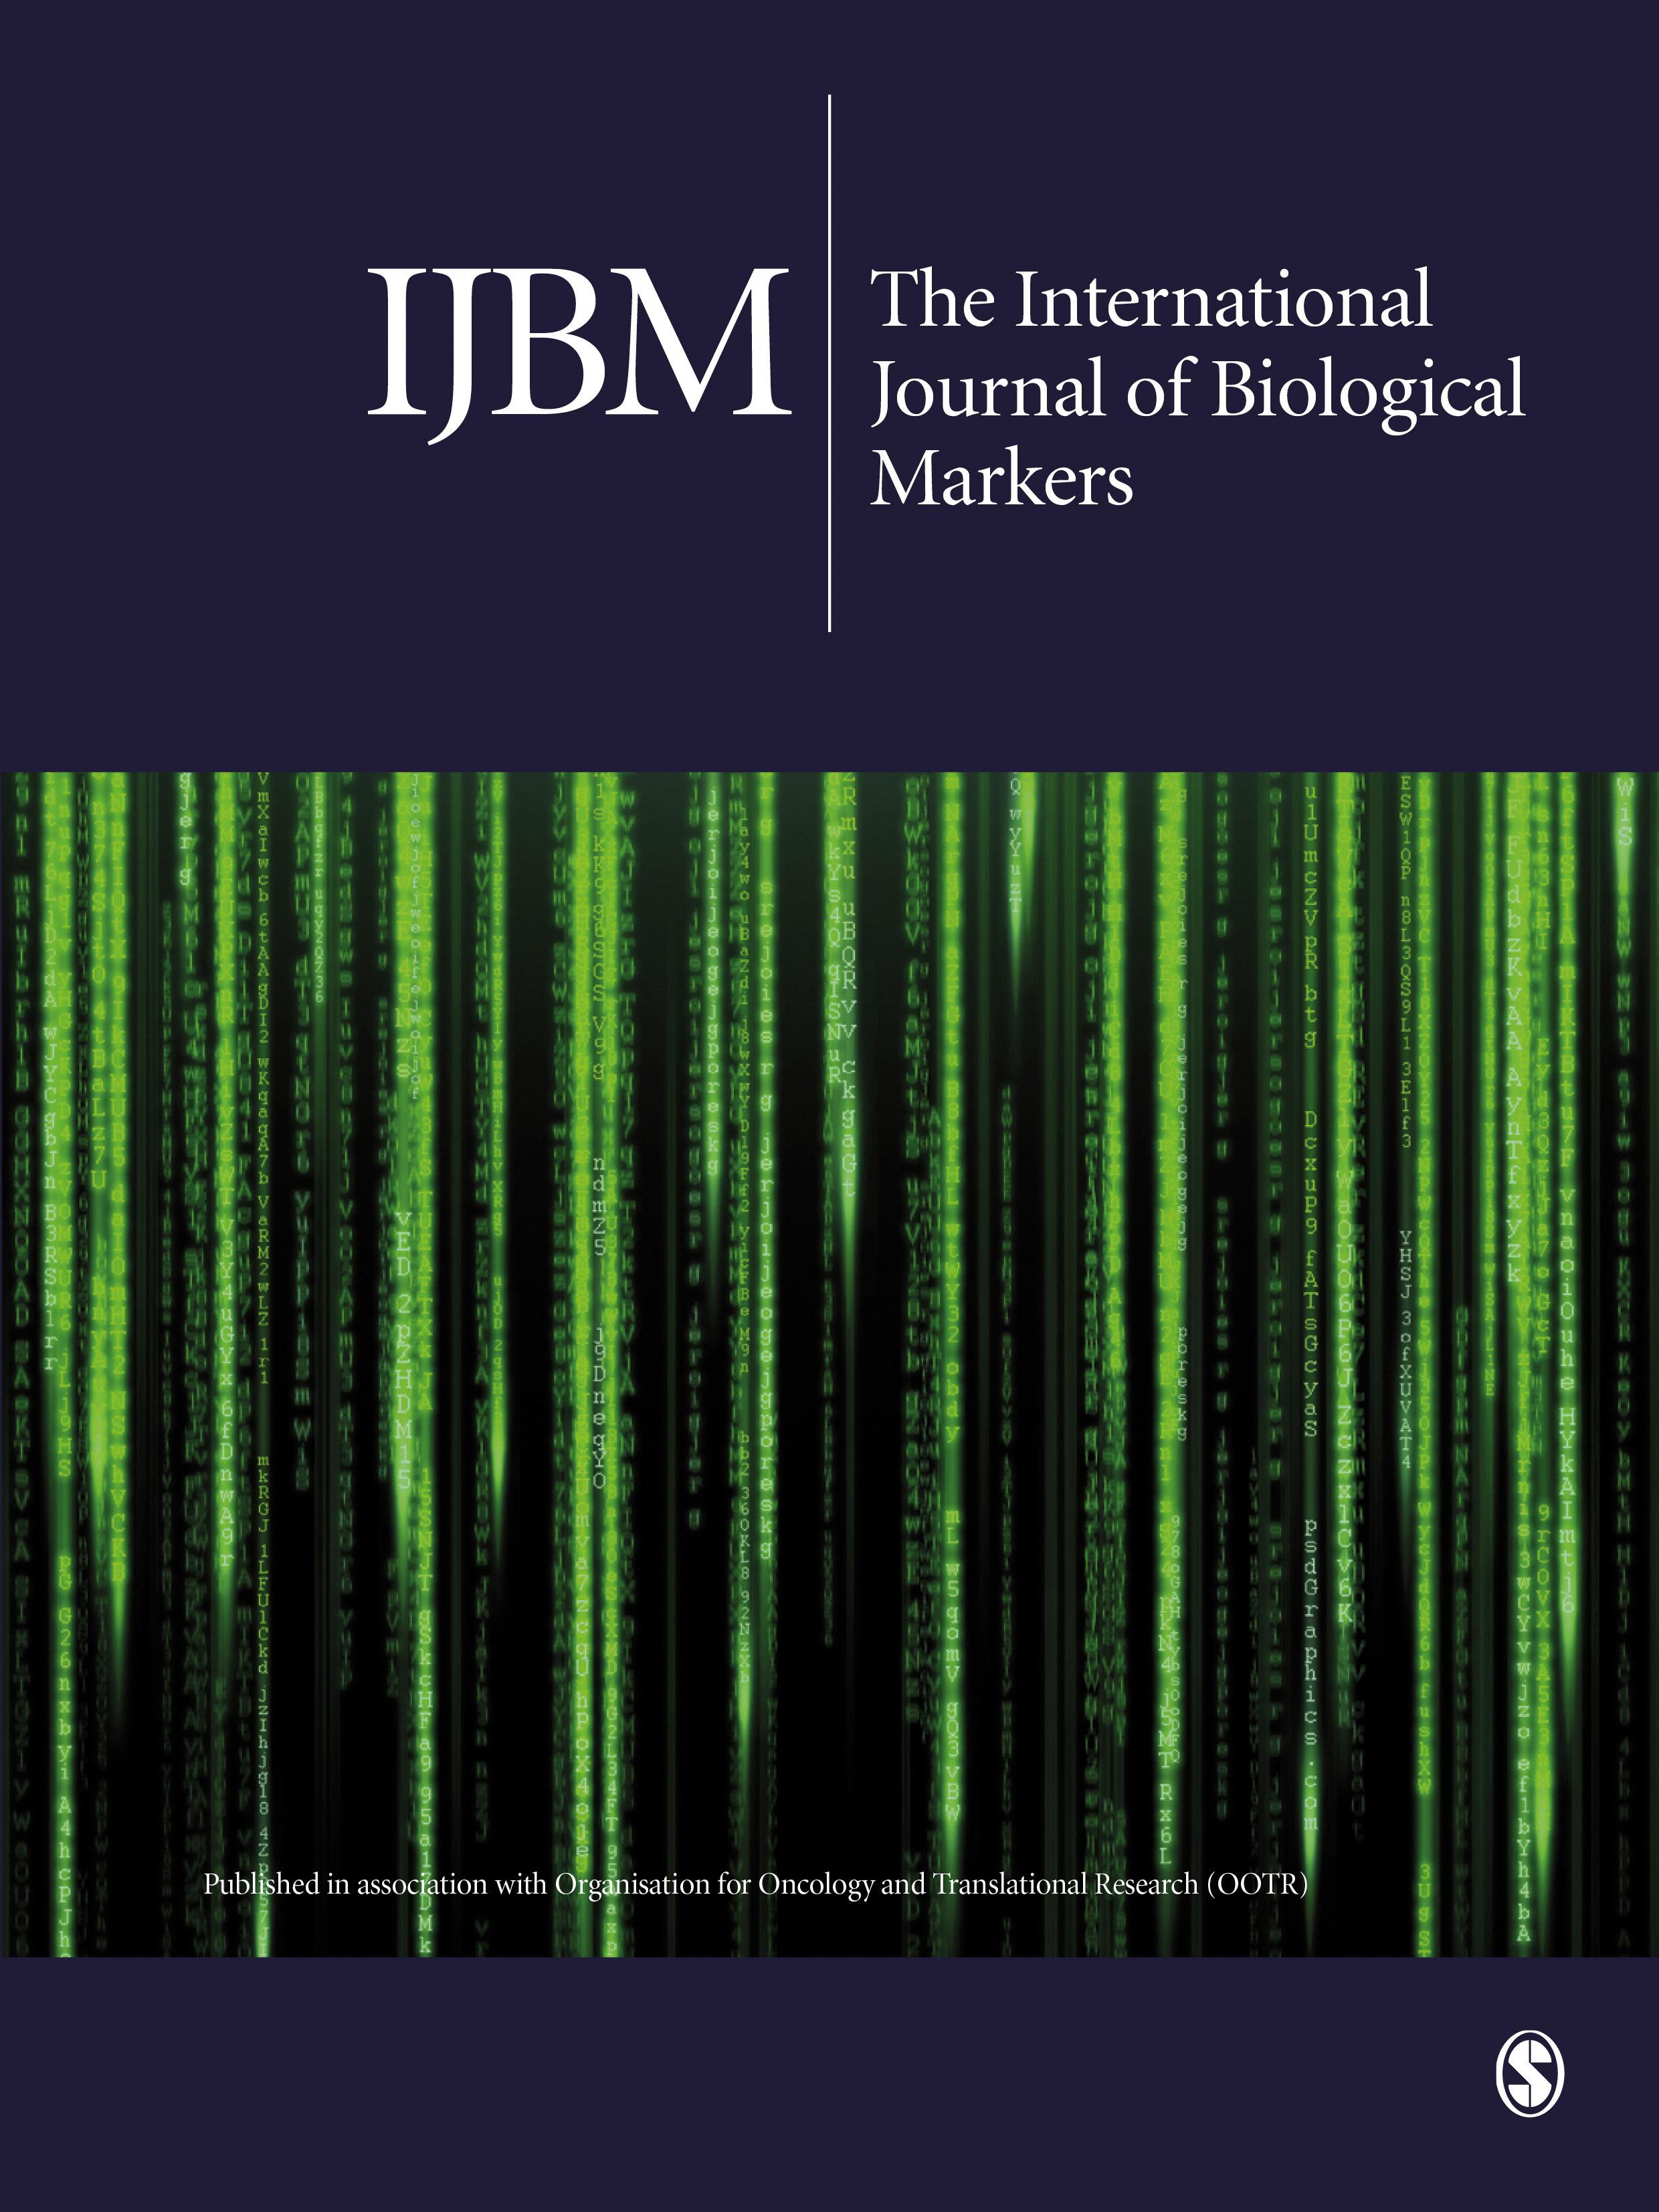 International Journal of Biological Markers